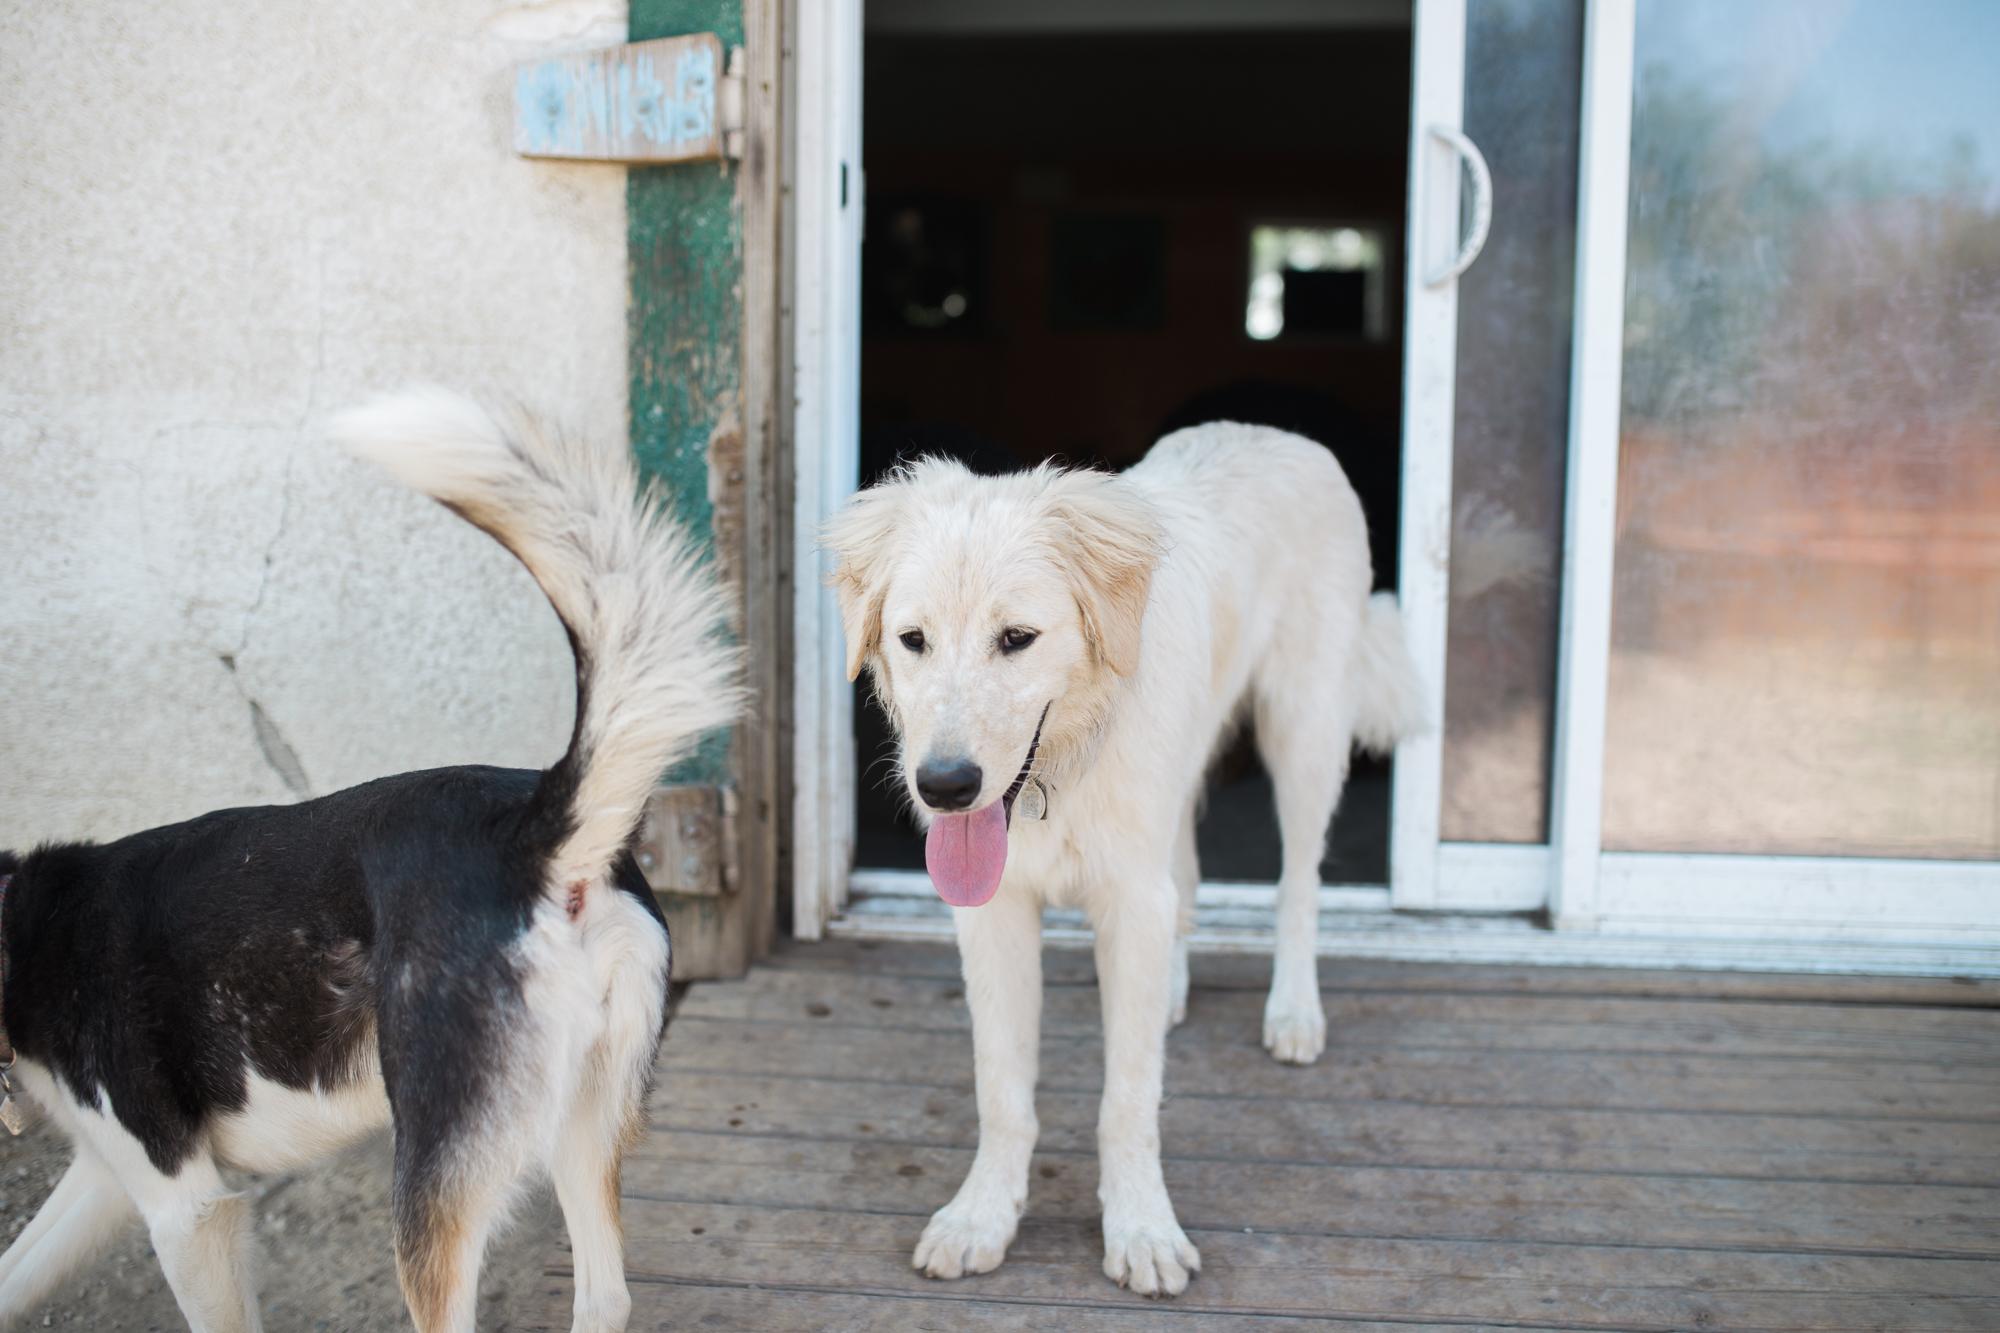 Barking-Good-Dogs-61.jpg